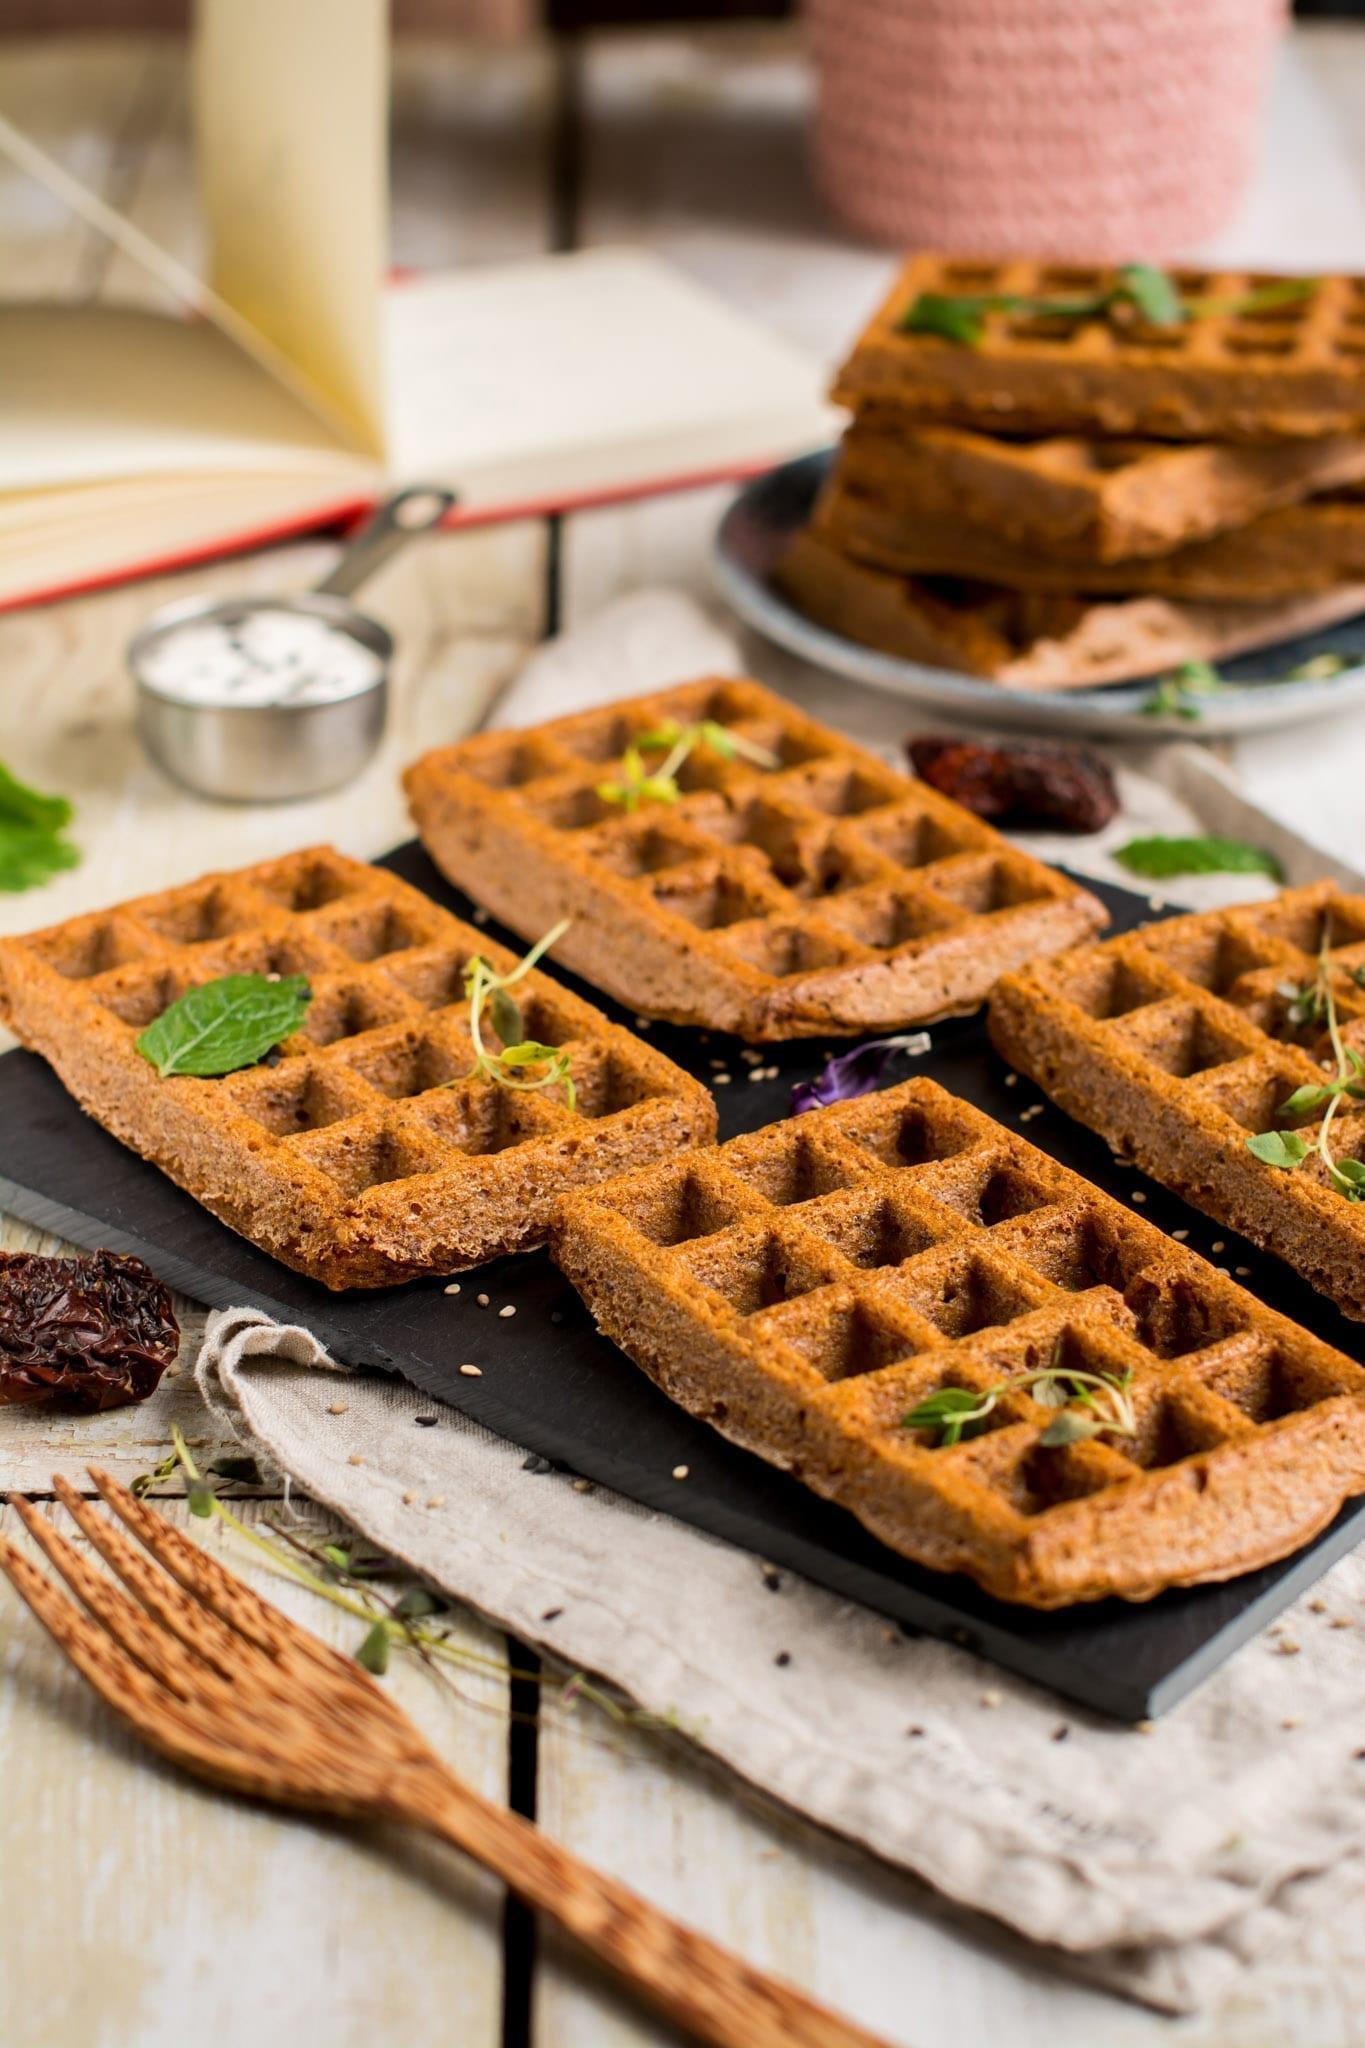 Vegan Gluten-Free Potato Waffles, Pizza Flavored